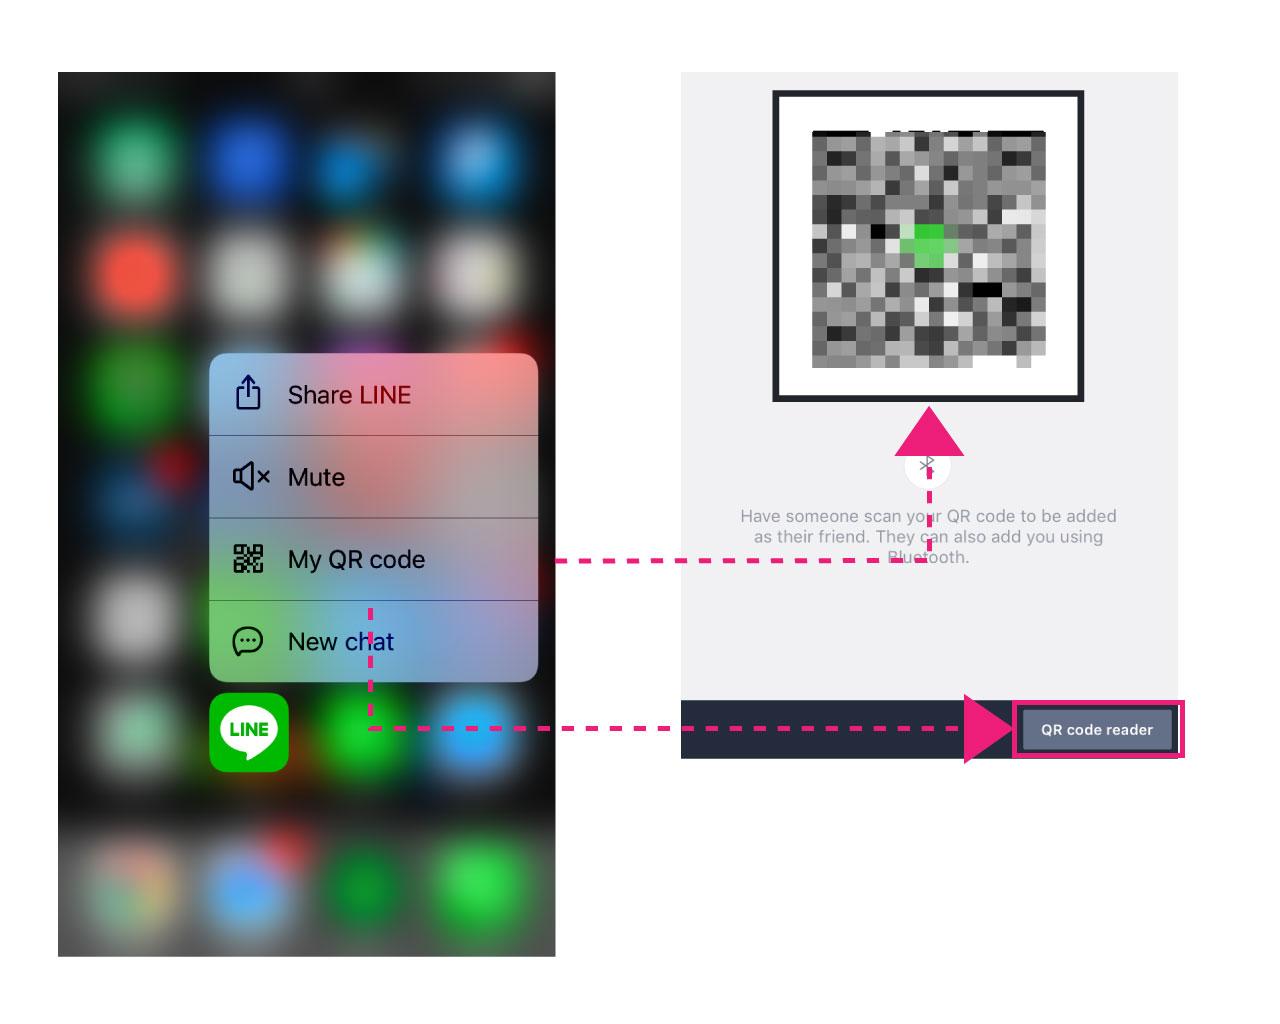 iphone-3dtouch-app-icon-shortcut-memu-4